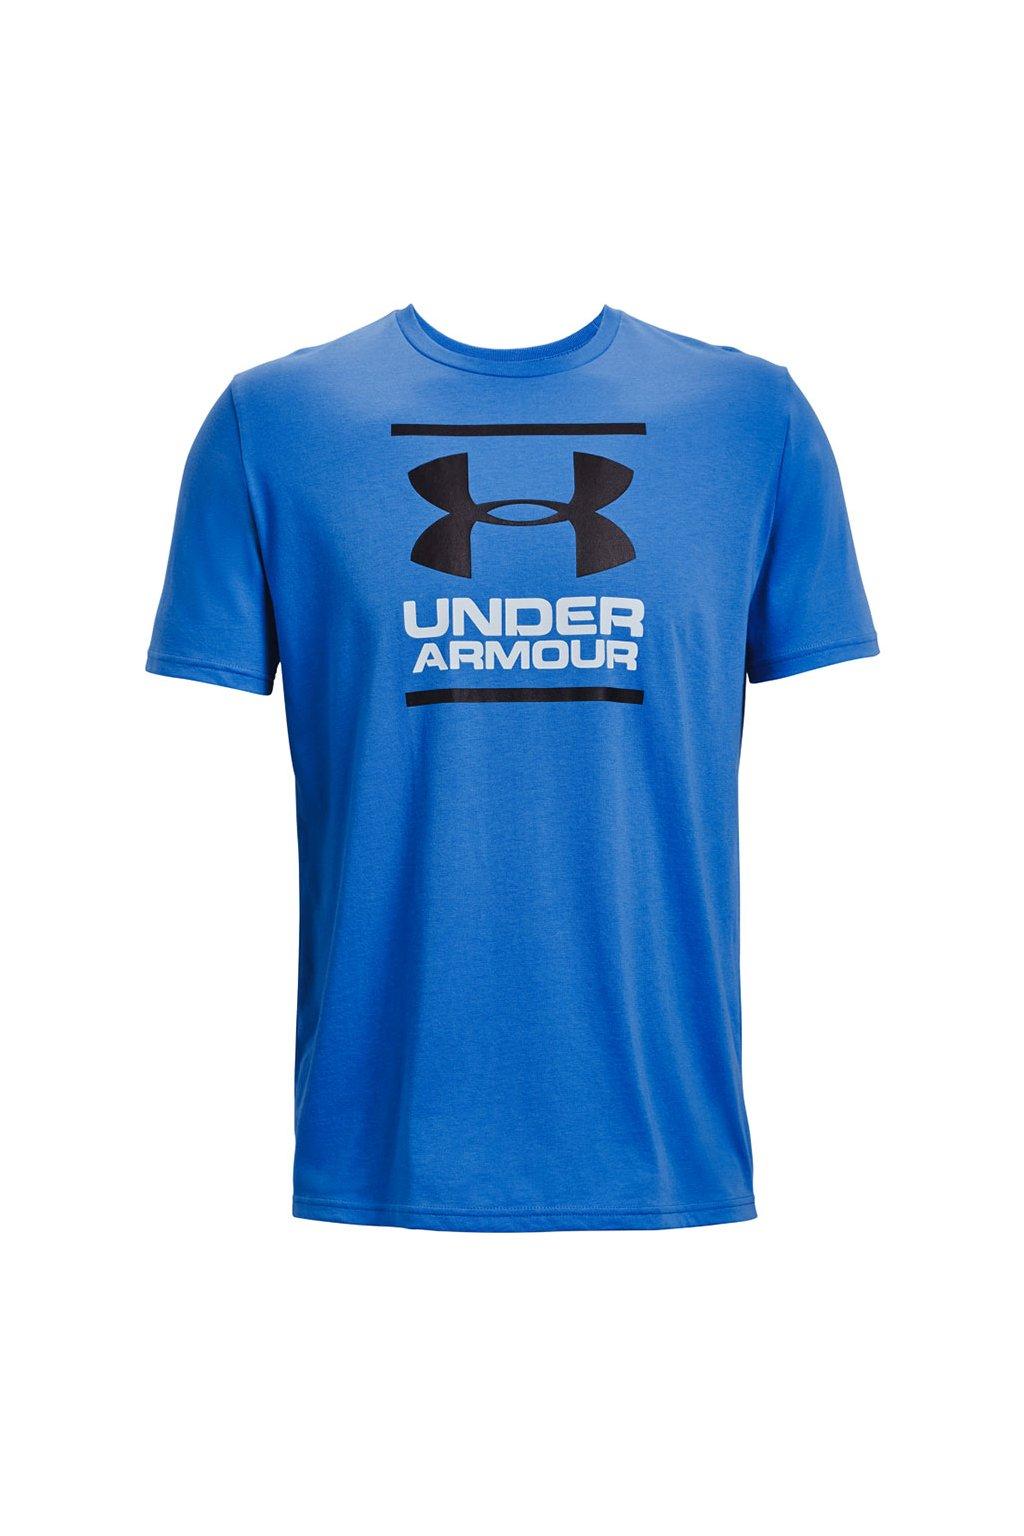 Pánske tričko Under Armour tmavomodré 1326849 787